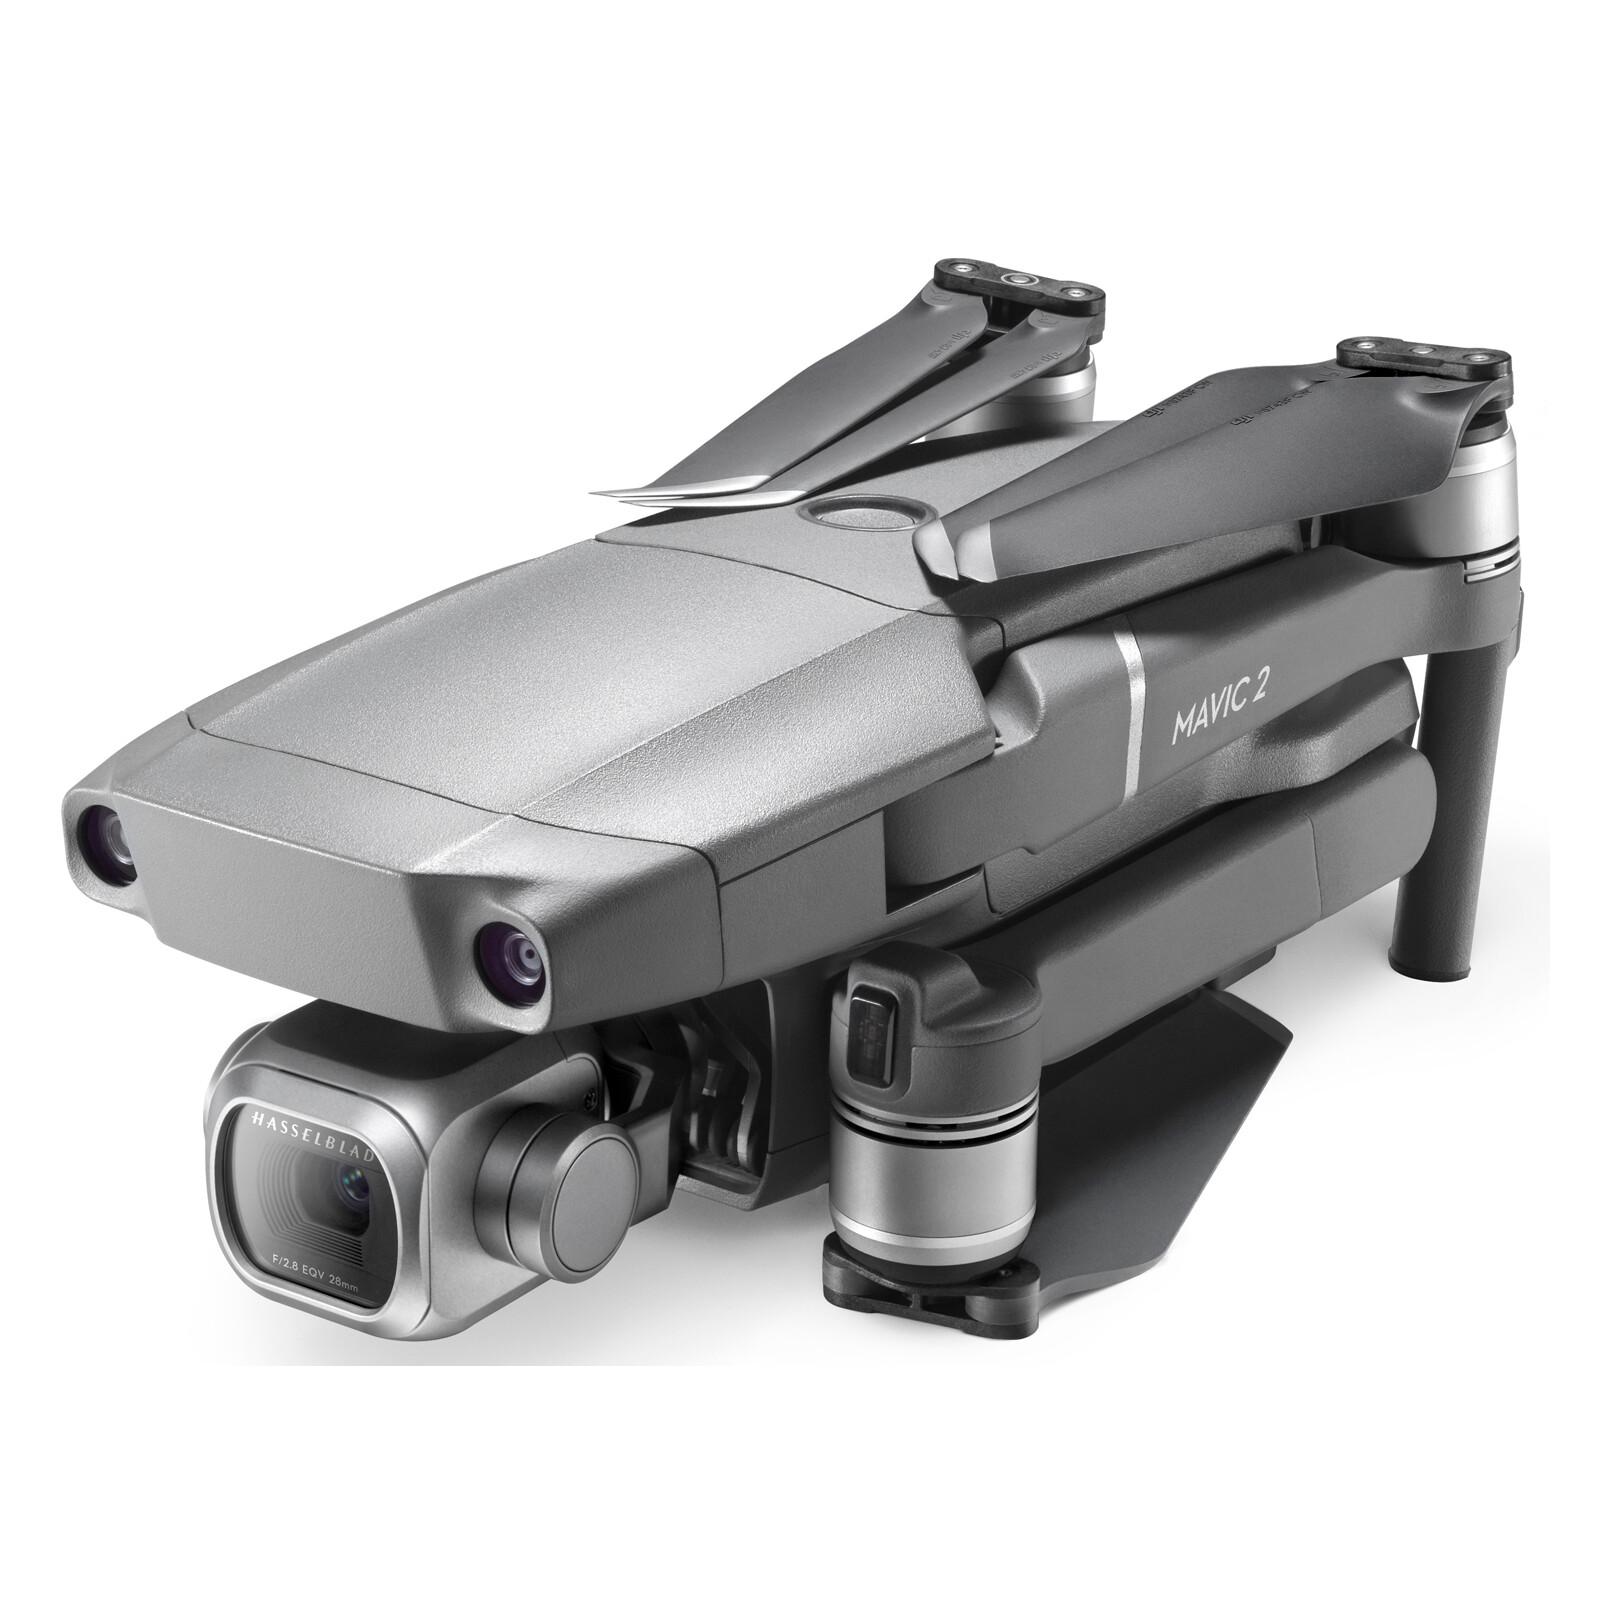 DJI Mavic 2 Pro (DJI Smart-Fernsteuerung)